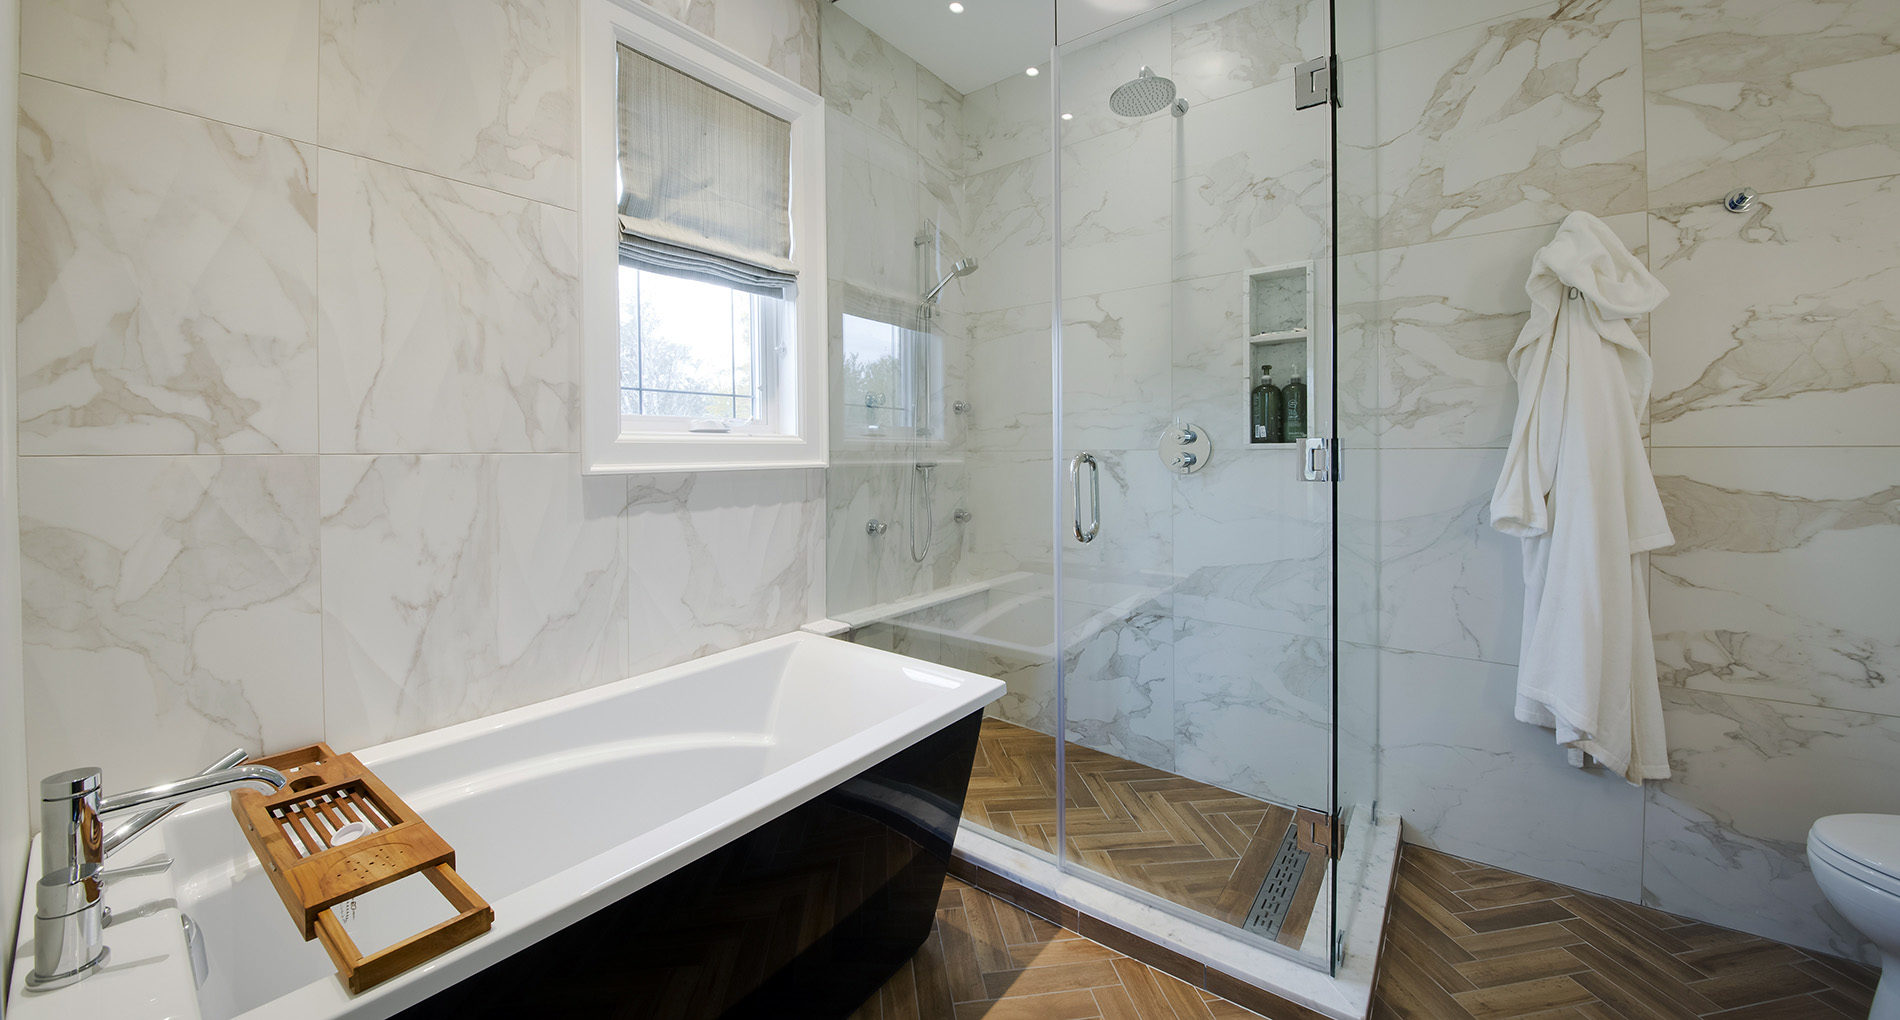 Bathroom Renovation Tricities Garner Slider